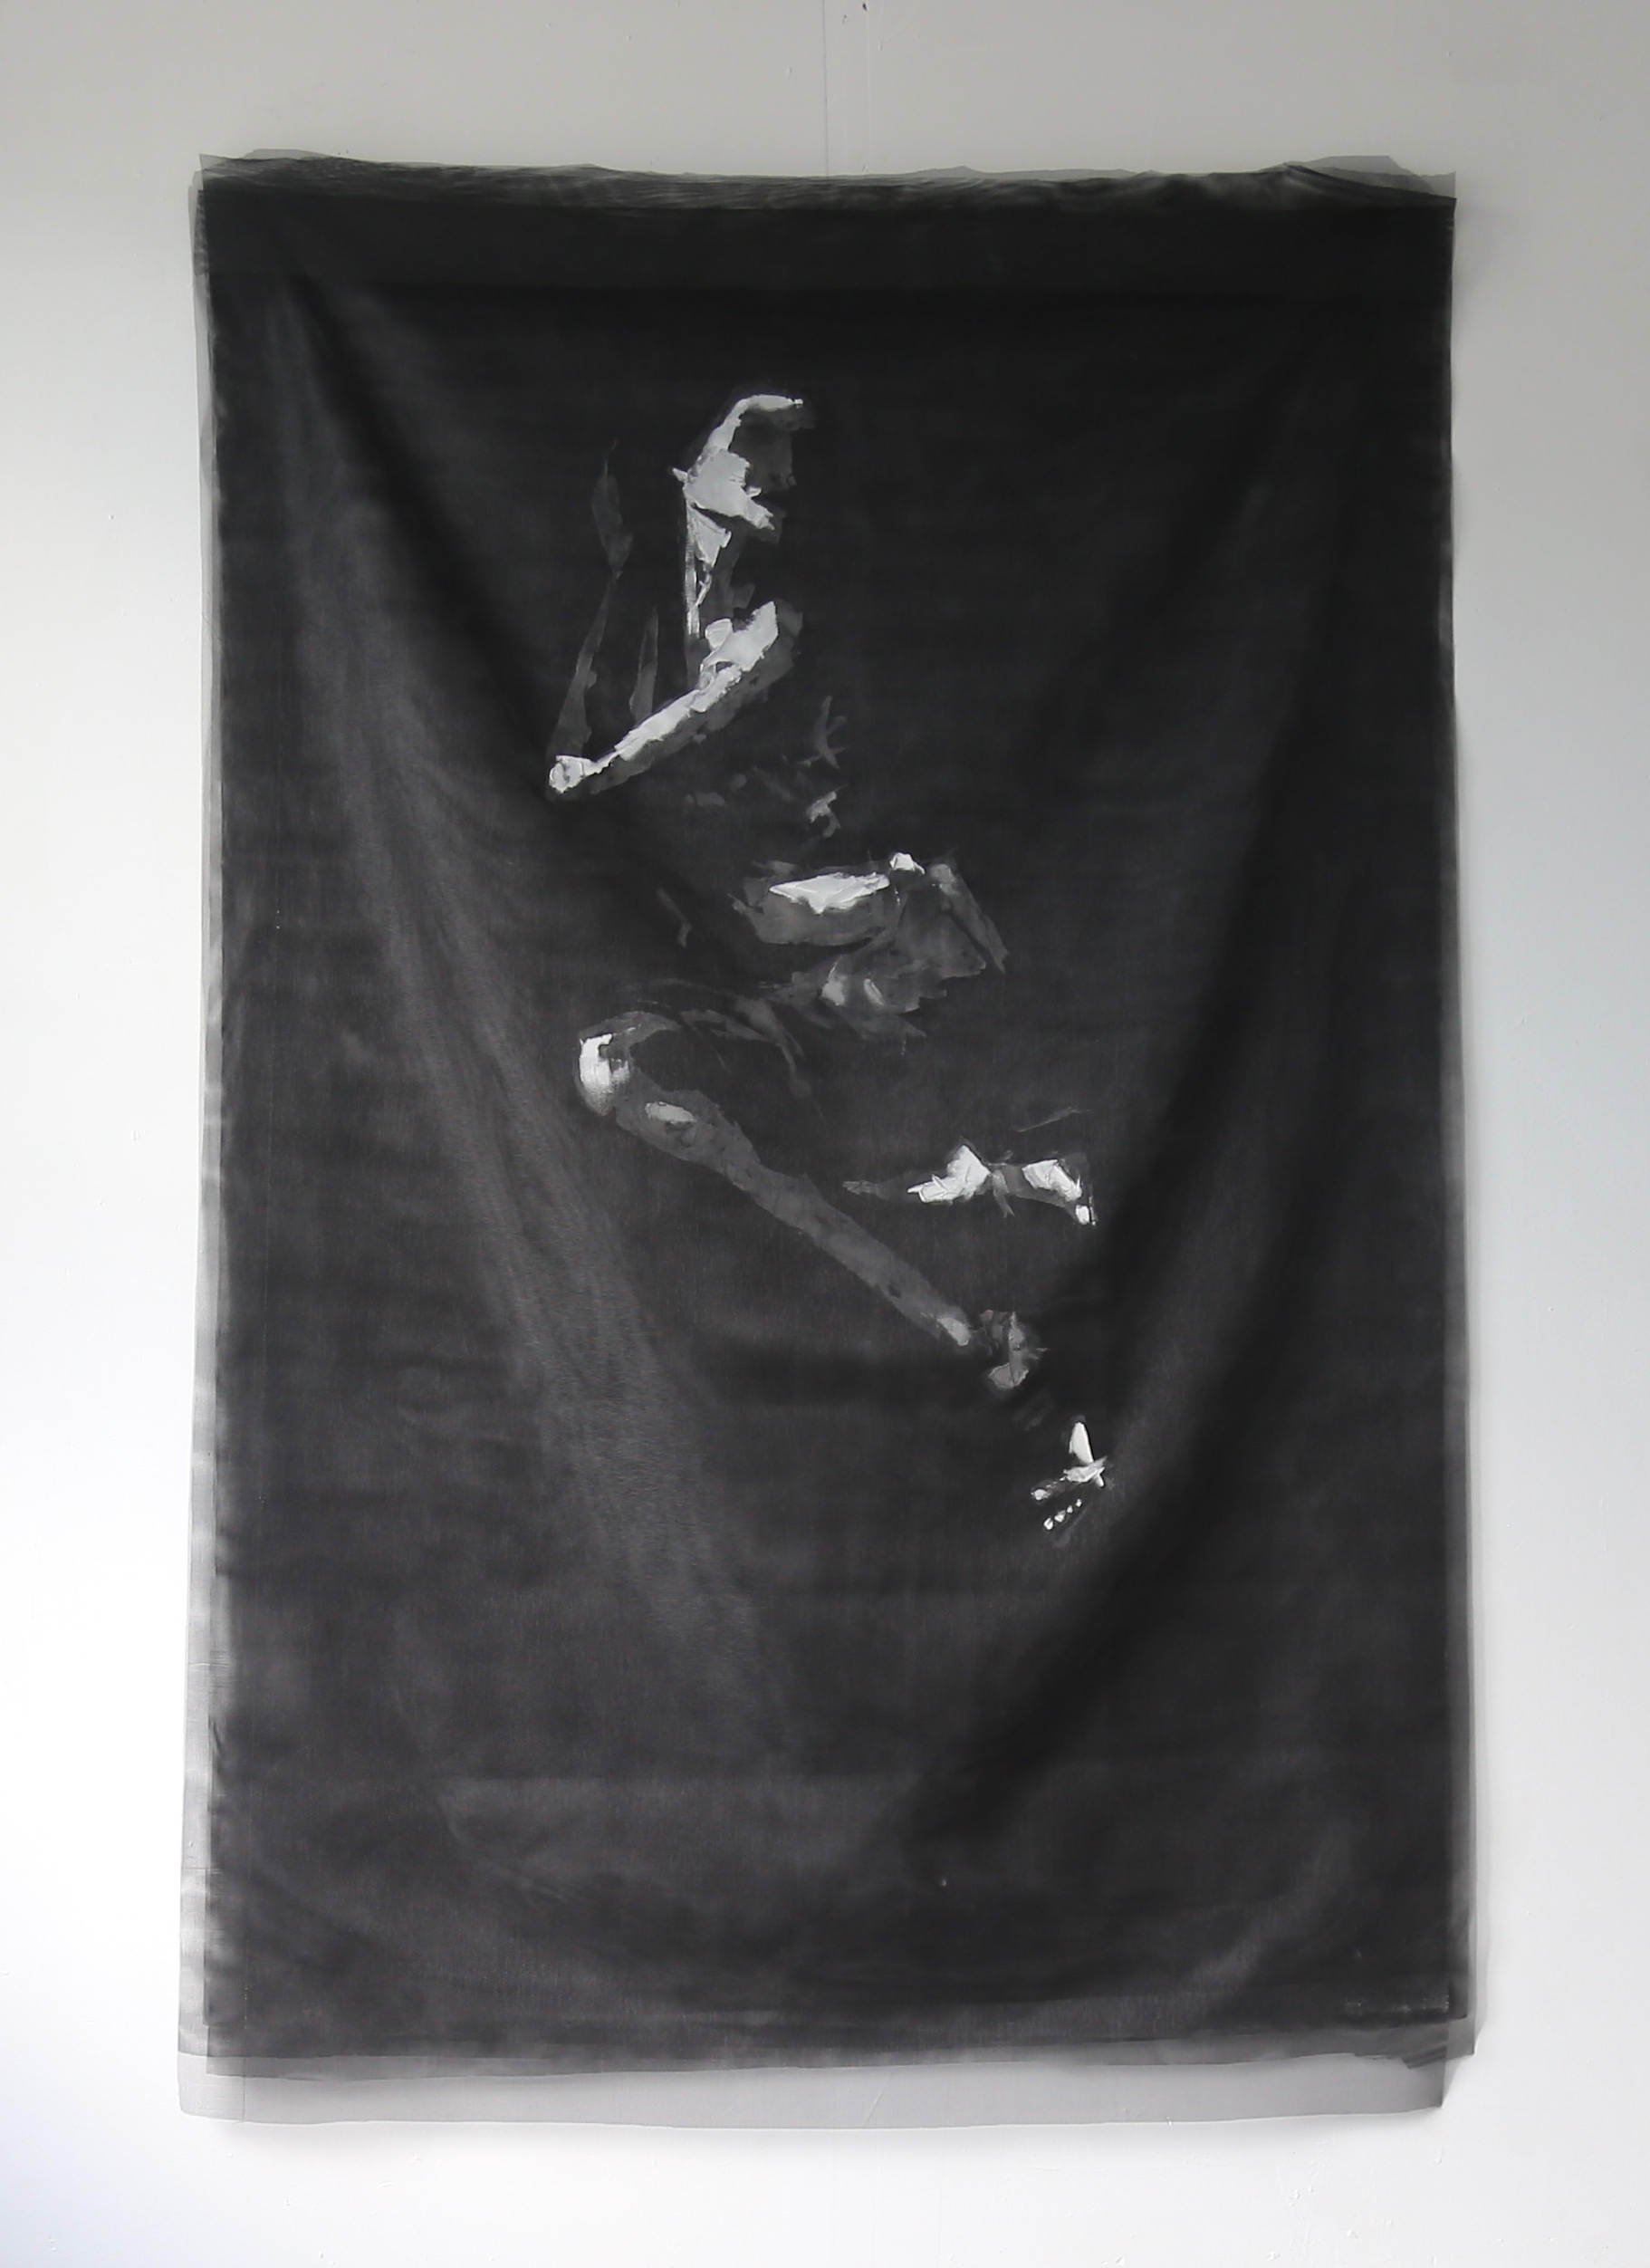 Untitled, (Reclining), 2006